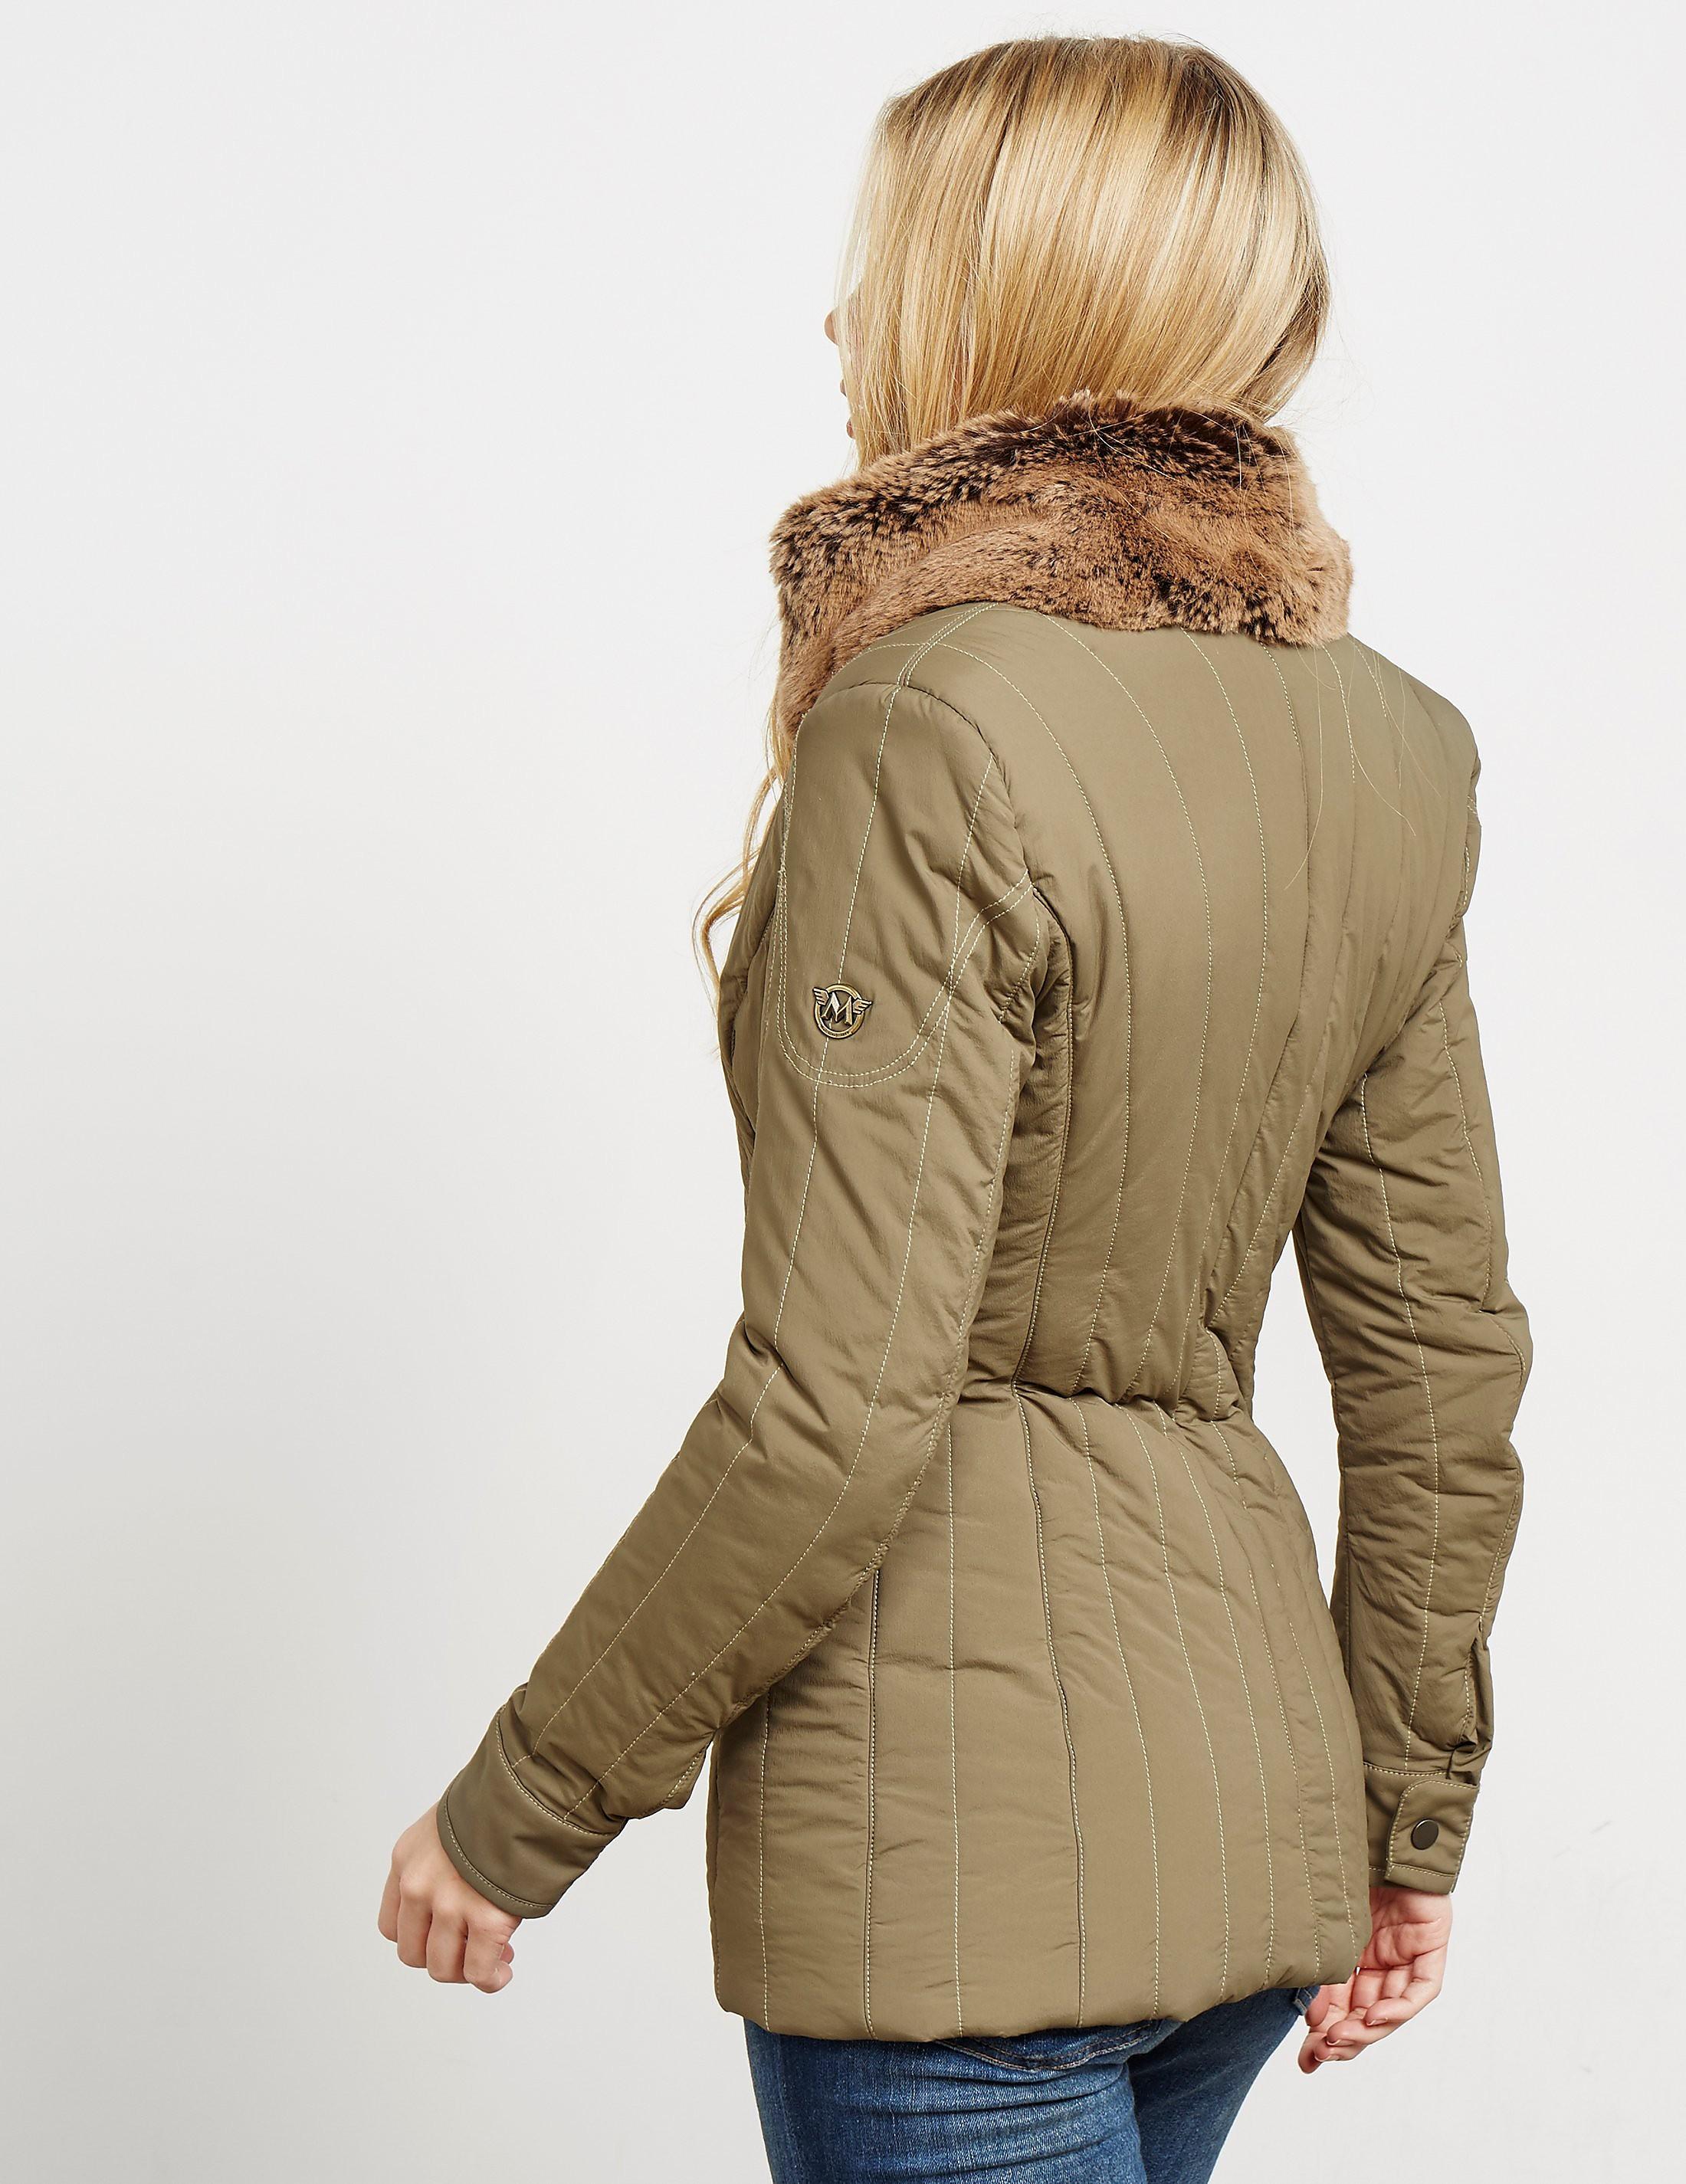 Matchless London Stirling Padded Jacket